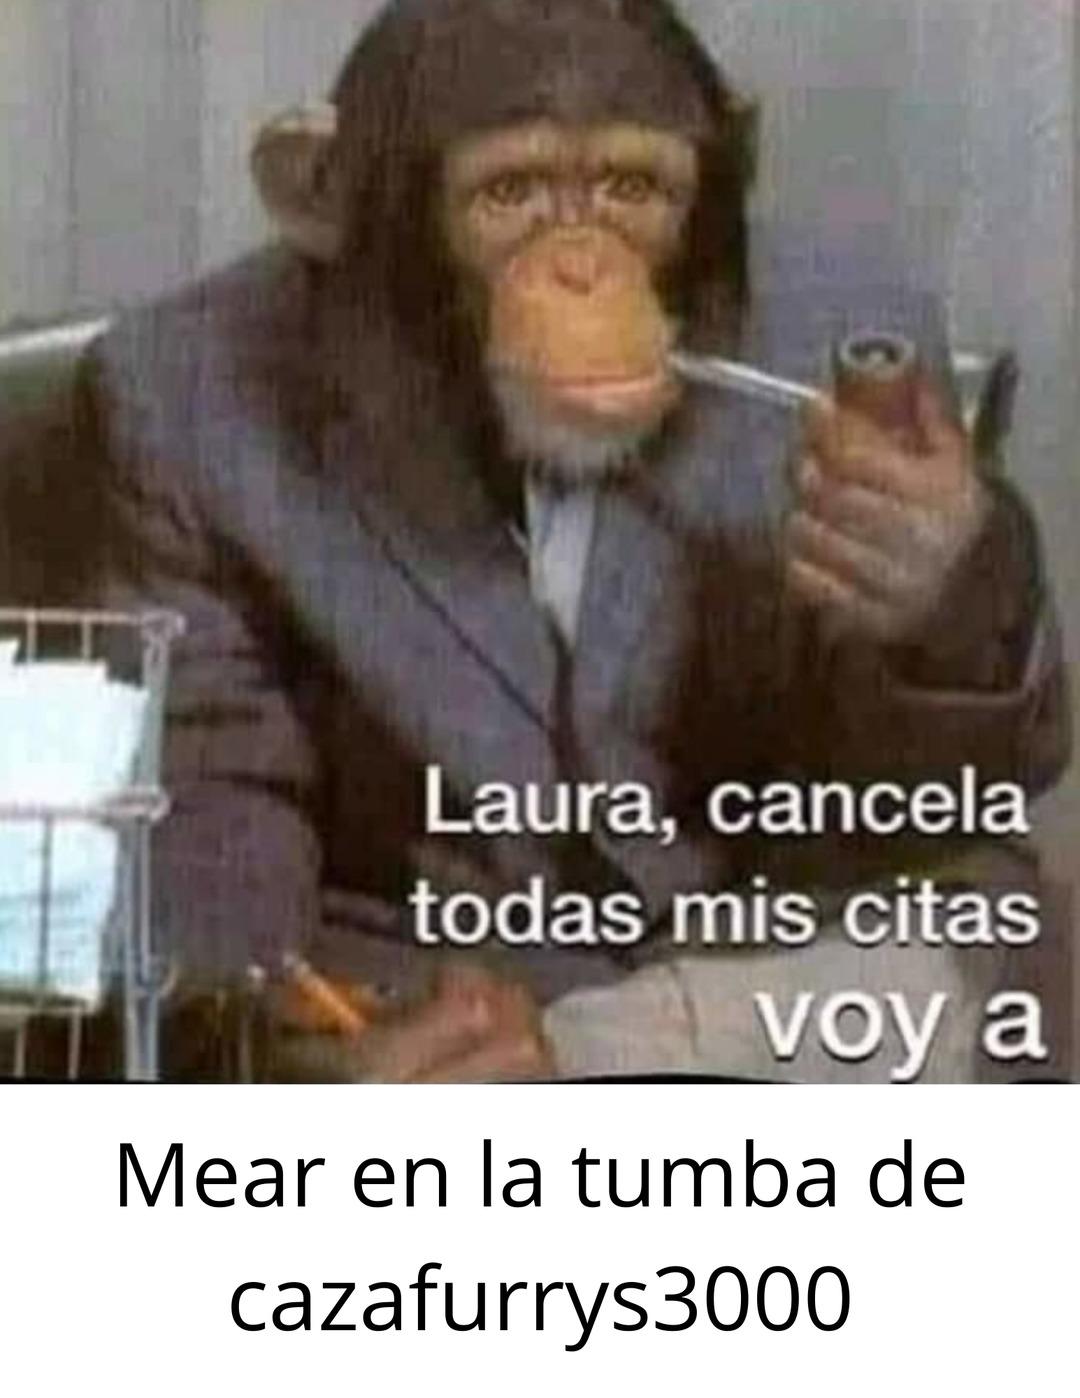 Cazafurrys3000 ¿?-2021 - meme